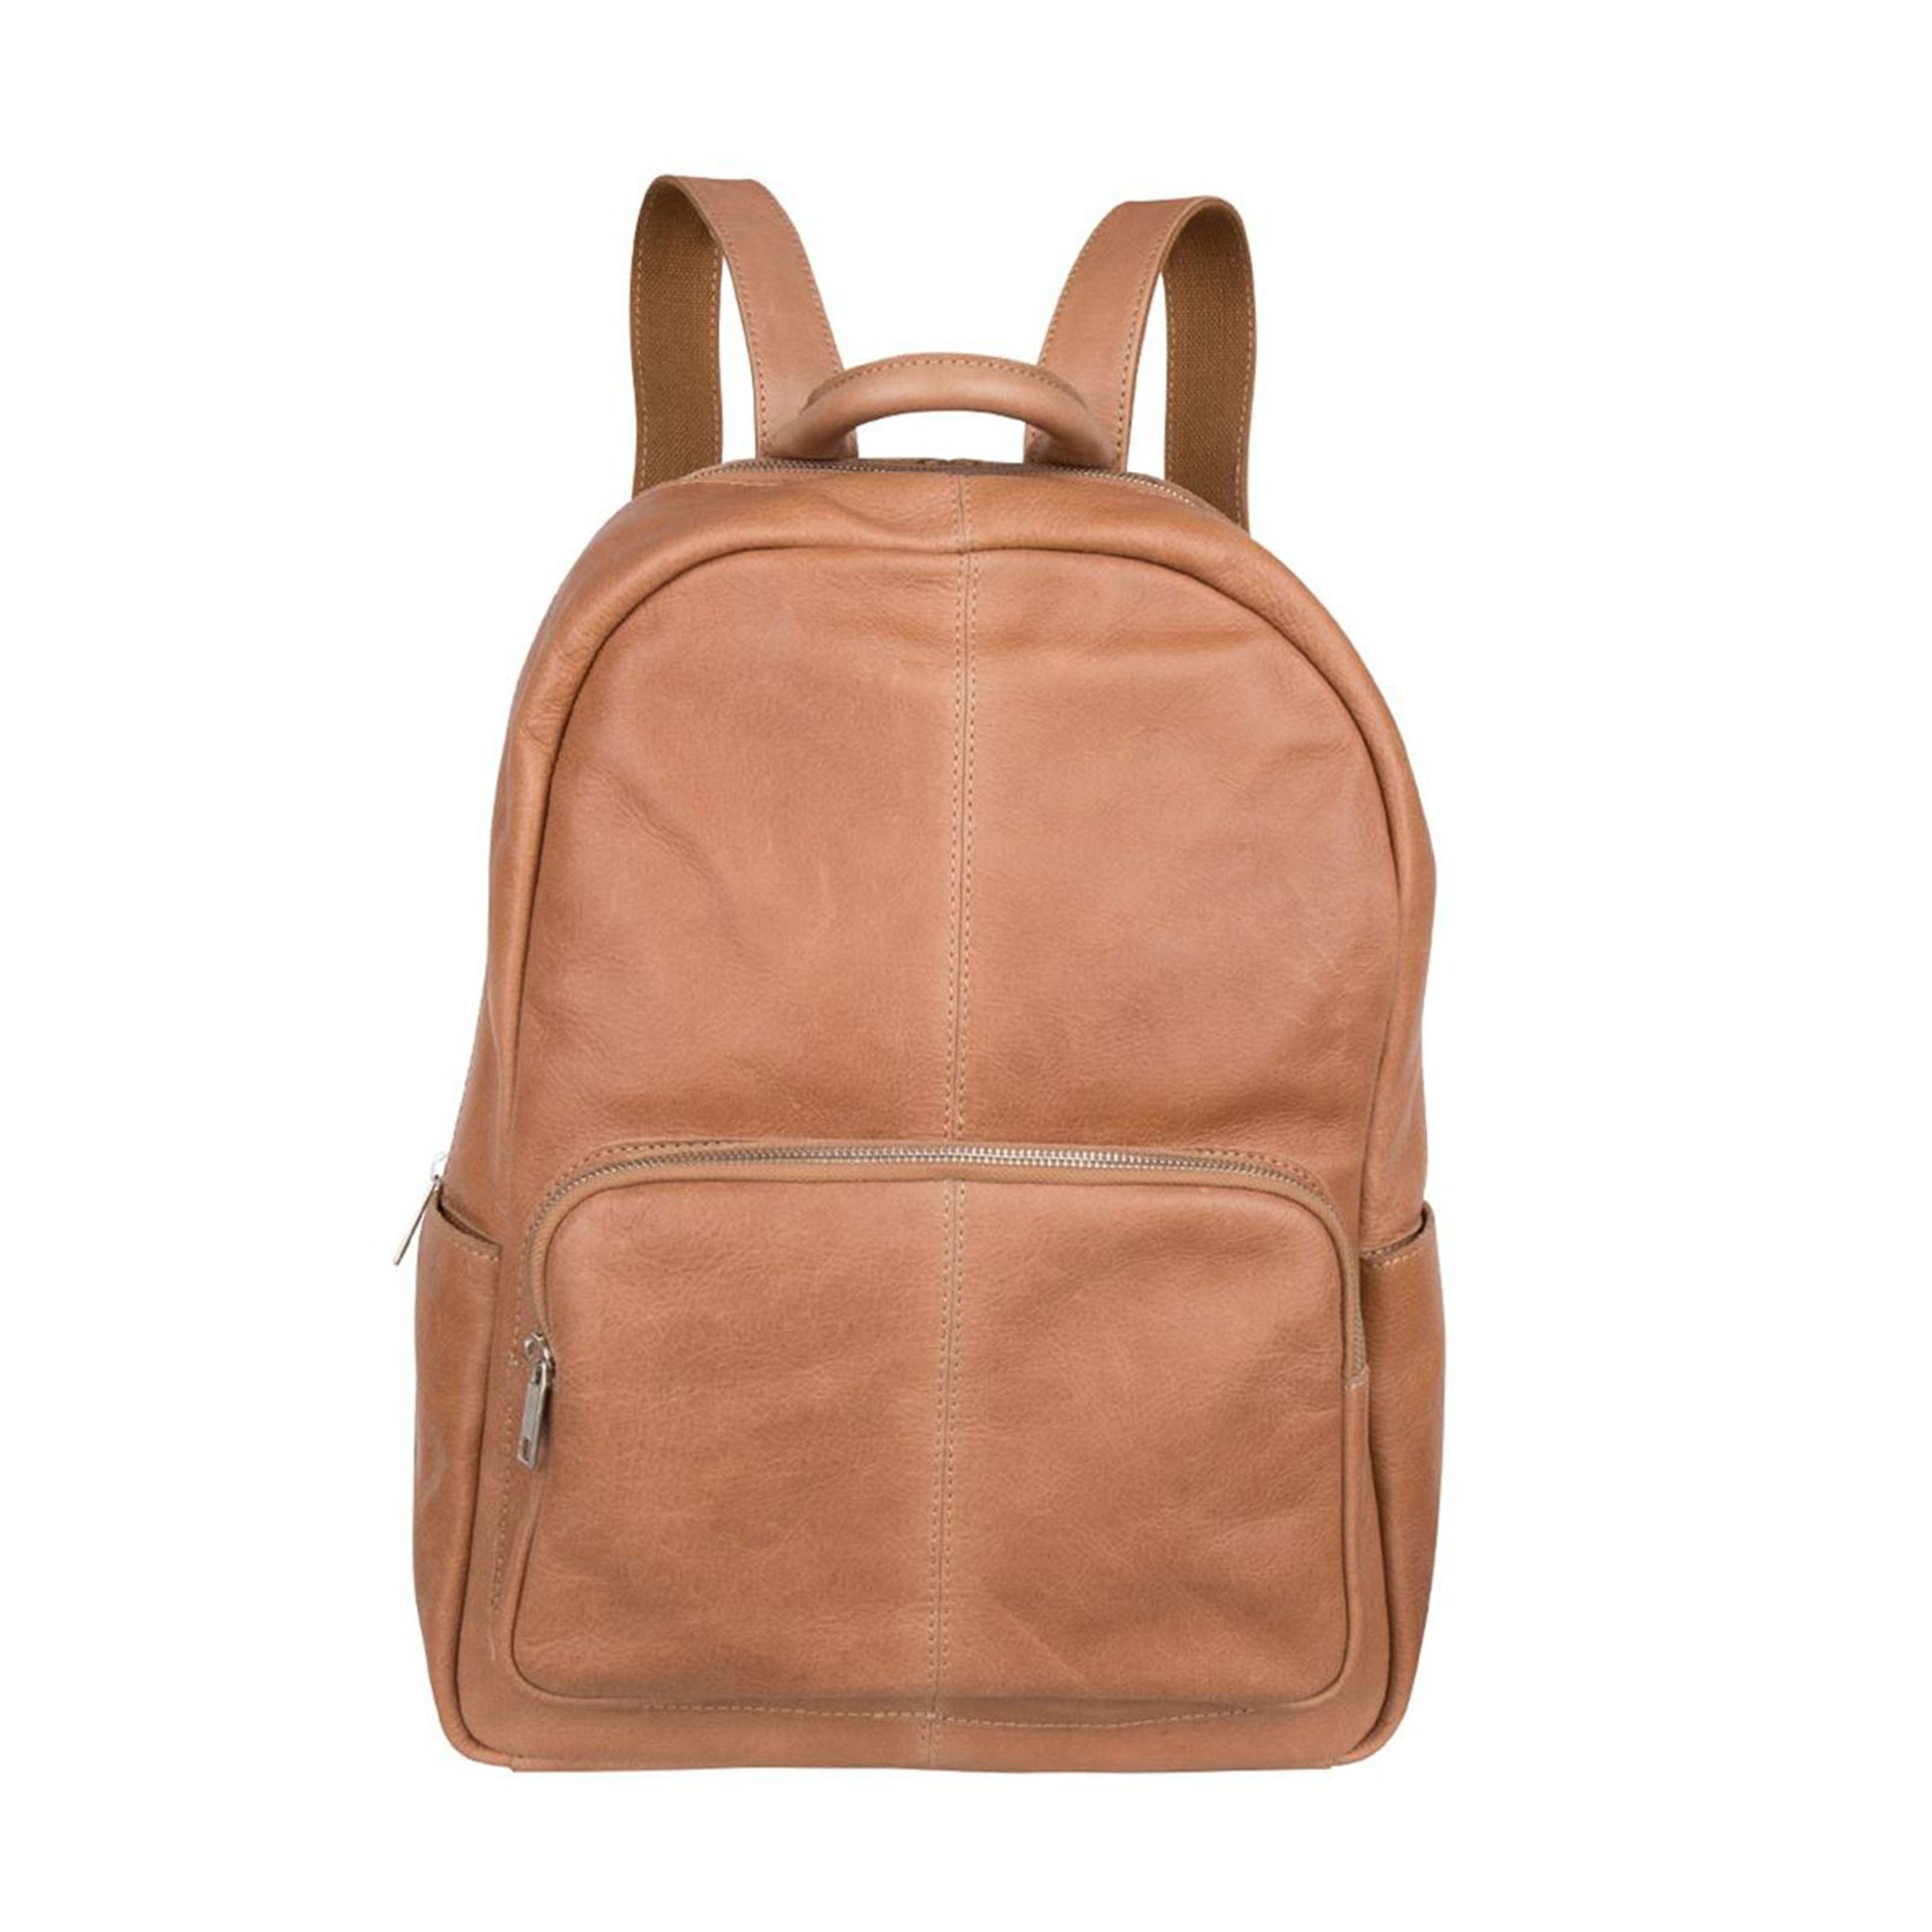 5a04ccbcbc377 COWBOYSBAG Rucksack Backpack Mason 15 Inch Camel Braun 2117 Damen ...